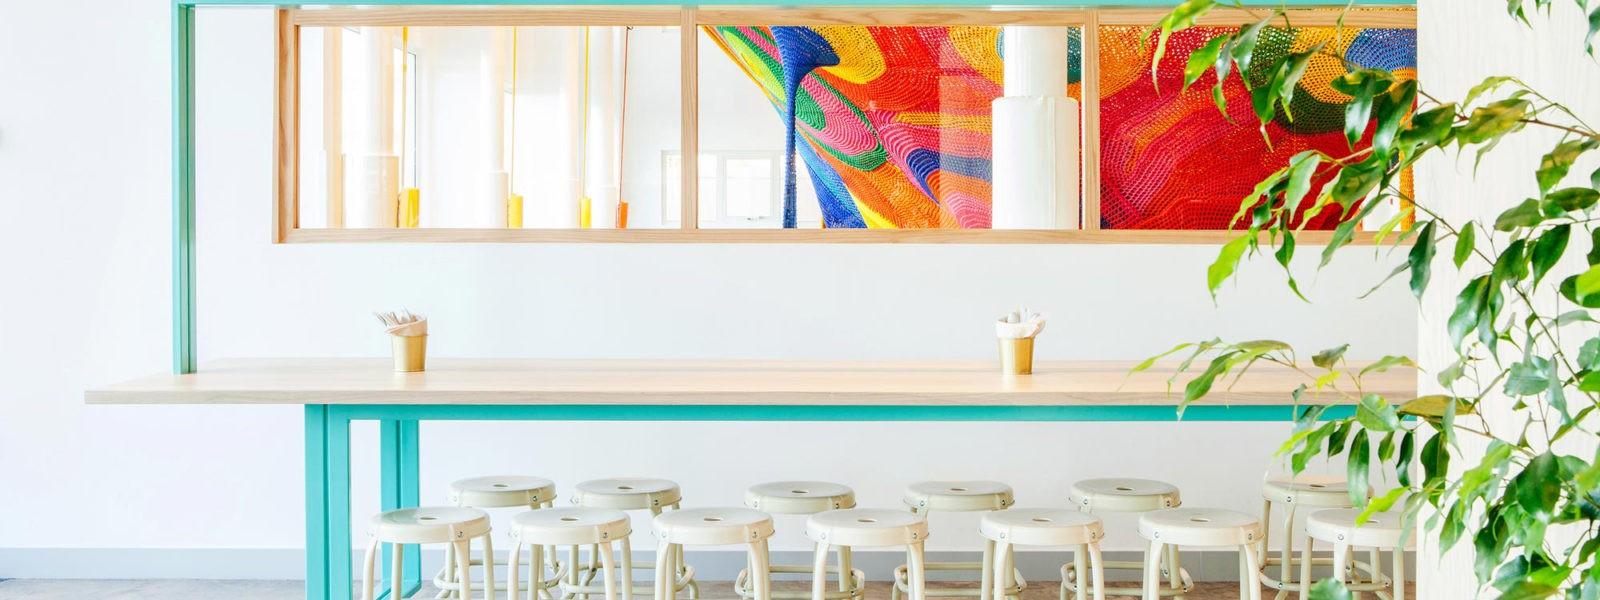 Sneha Divias Atelier - La Petite Treehouse Cafe - OliOli